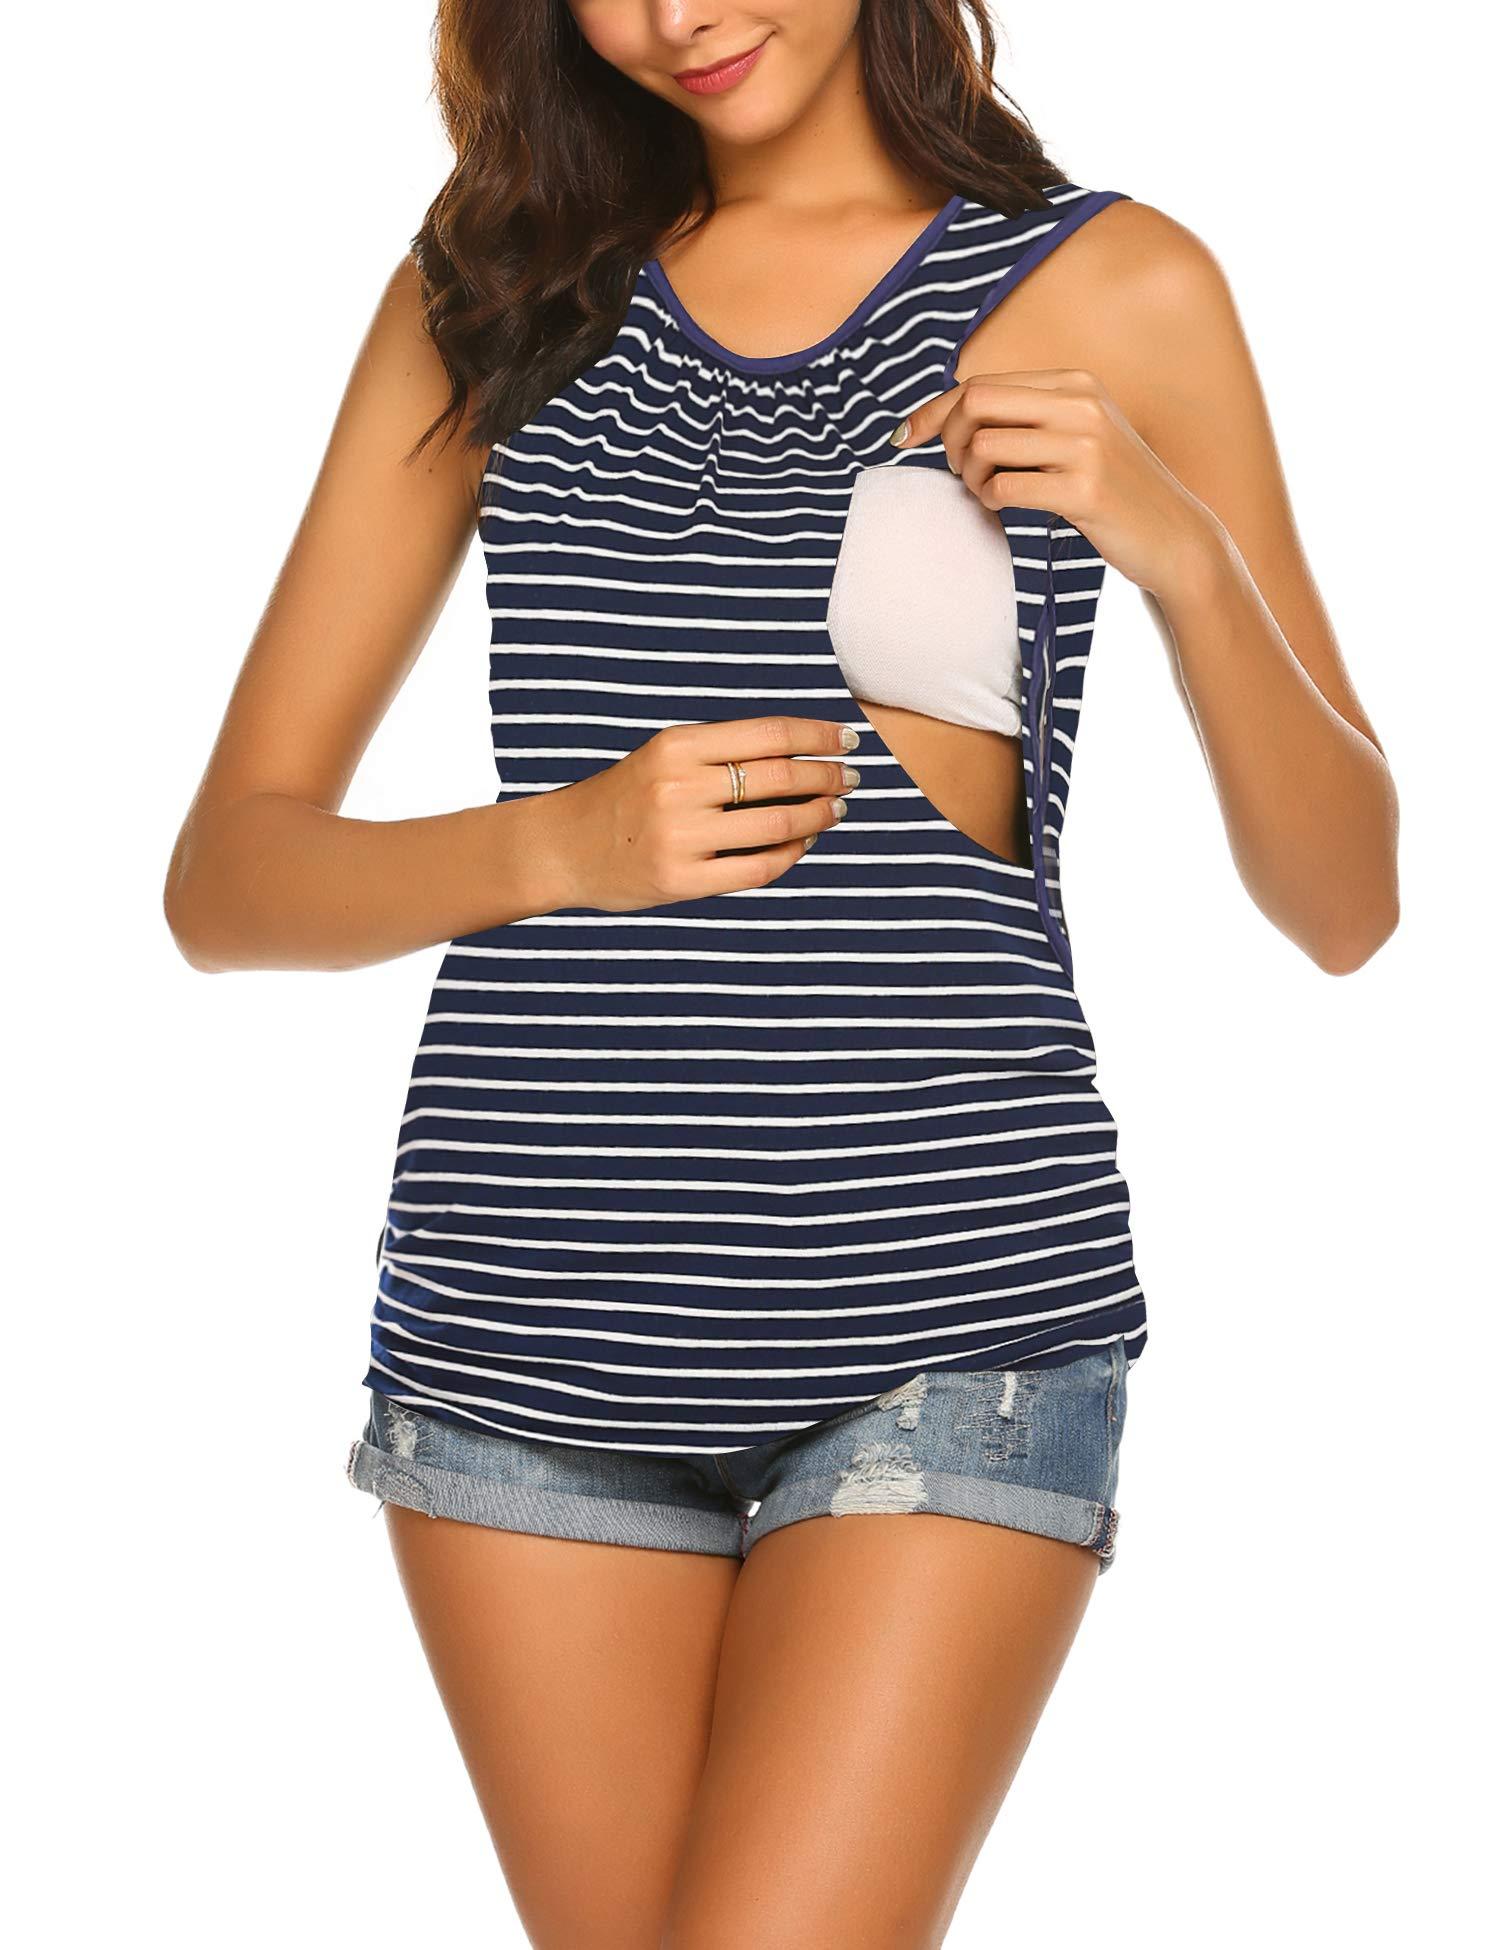 Ekouaer Maternity Clothes Womens Nursing Tops for Breastfeeding Tee Shirts Soft Double Layer Short Sleeve Pregnancy Pajamas